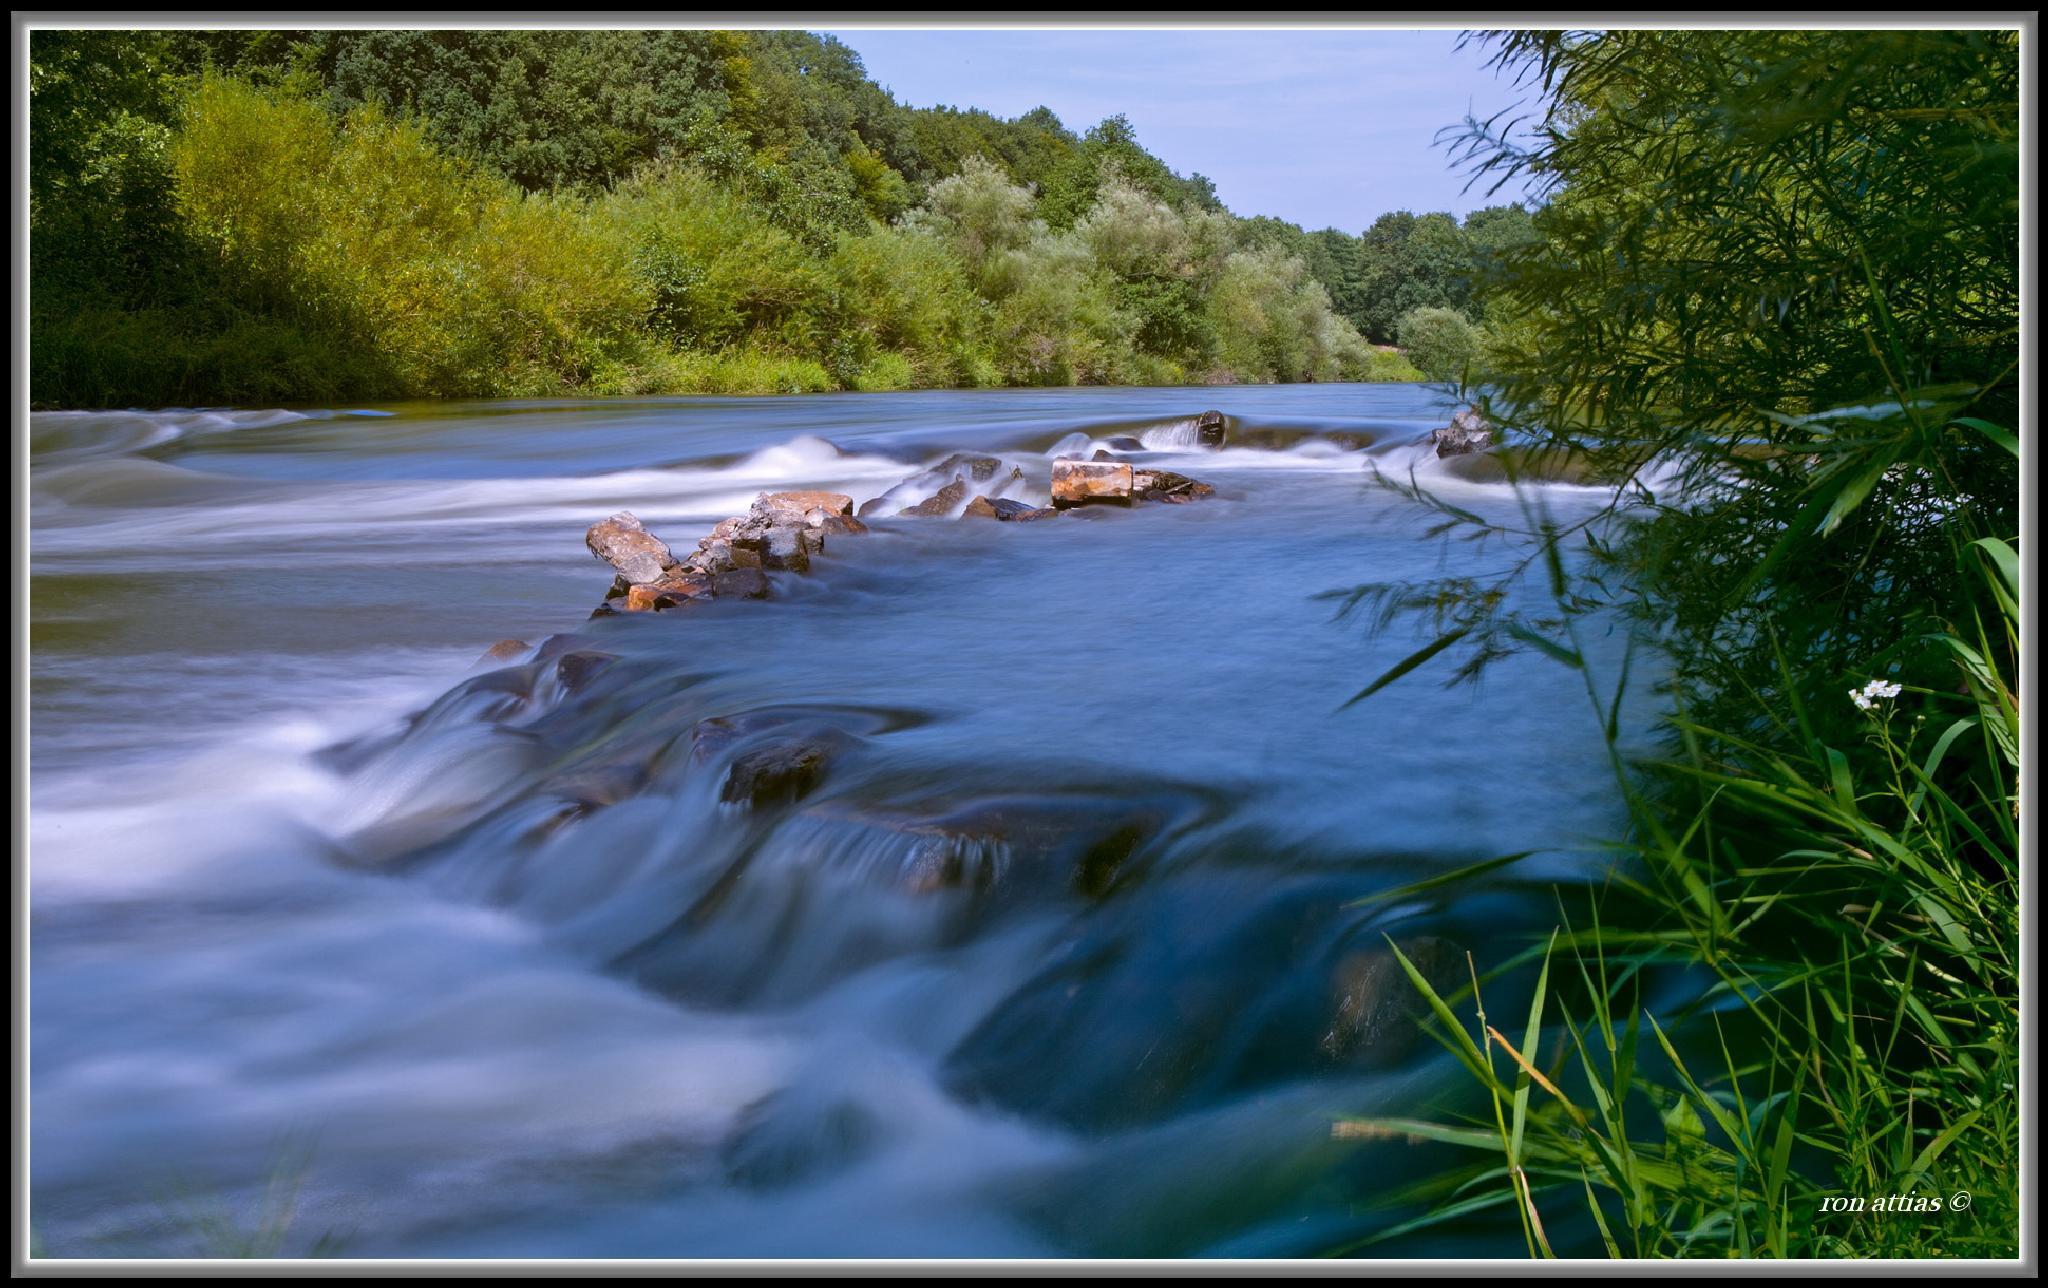 Jordan River, Israel by ron.attias.7